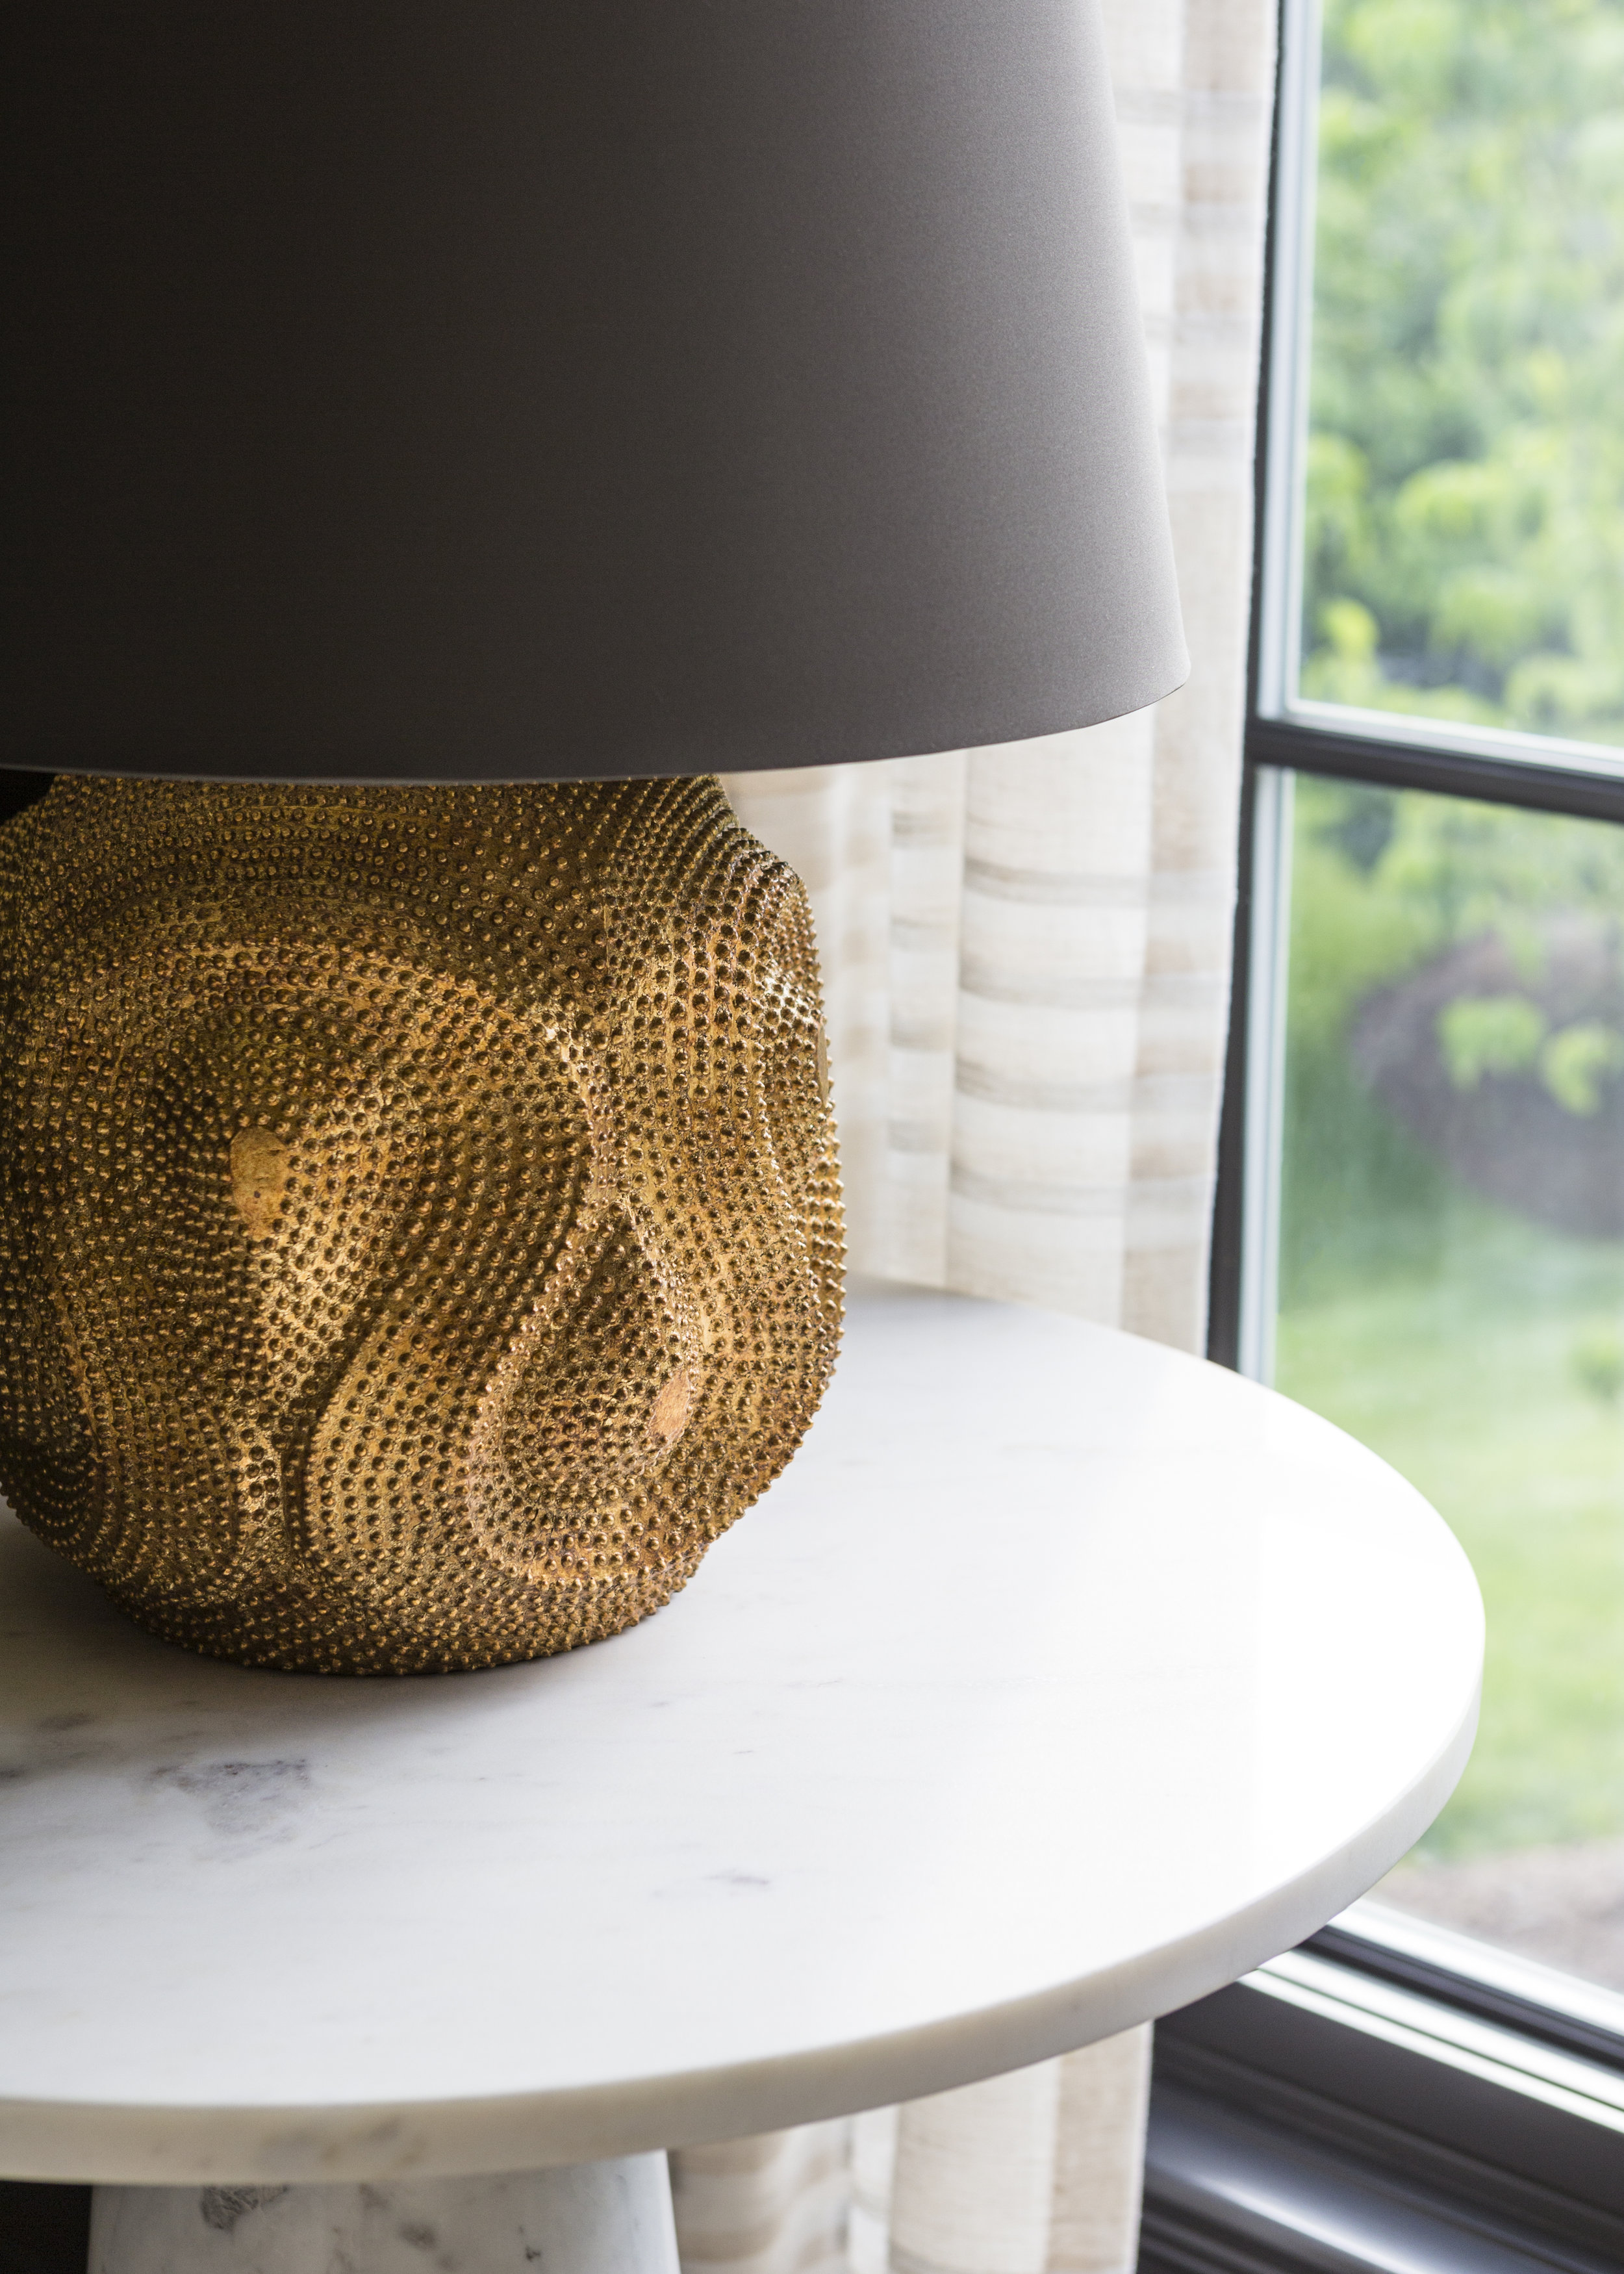 4 Dallianc_Halper_Details_lamp.jpg